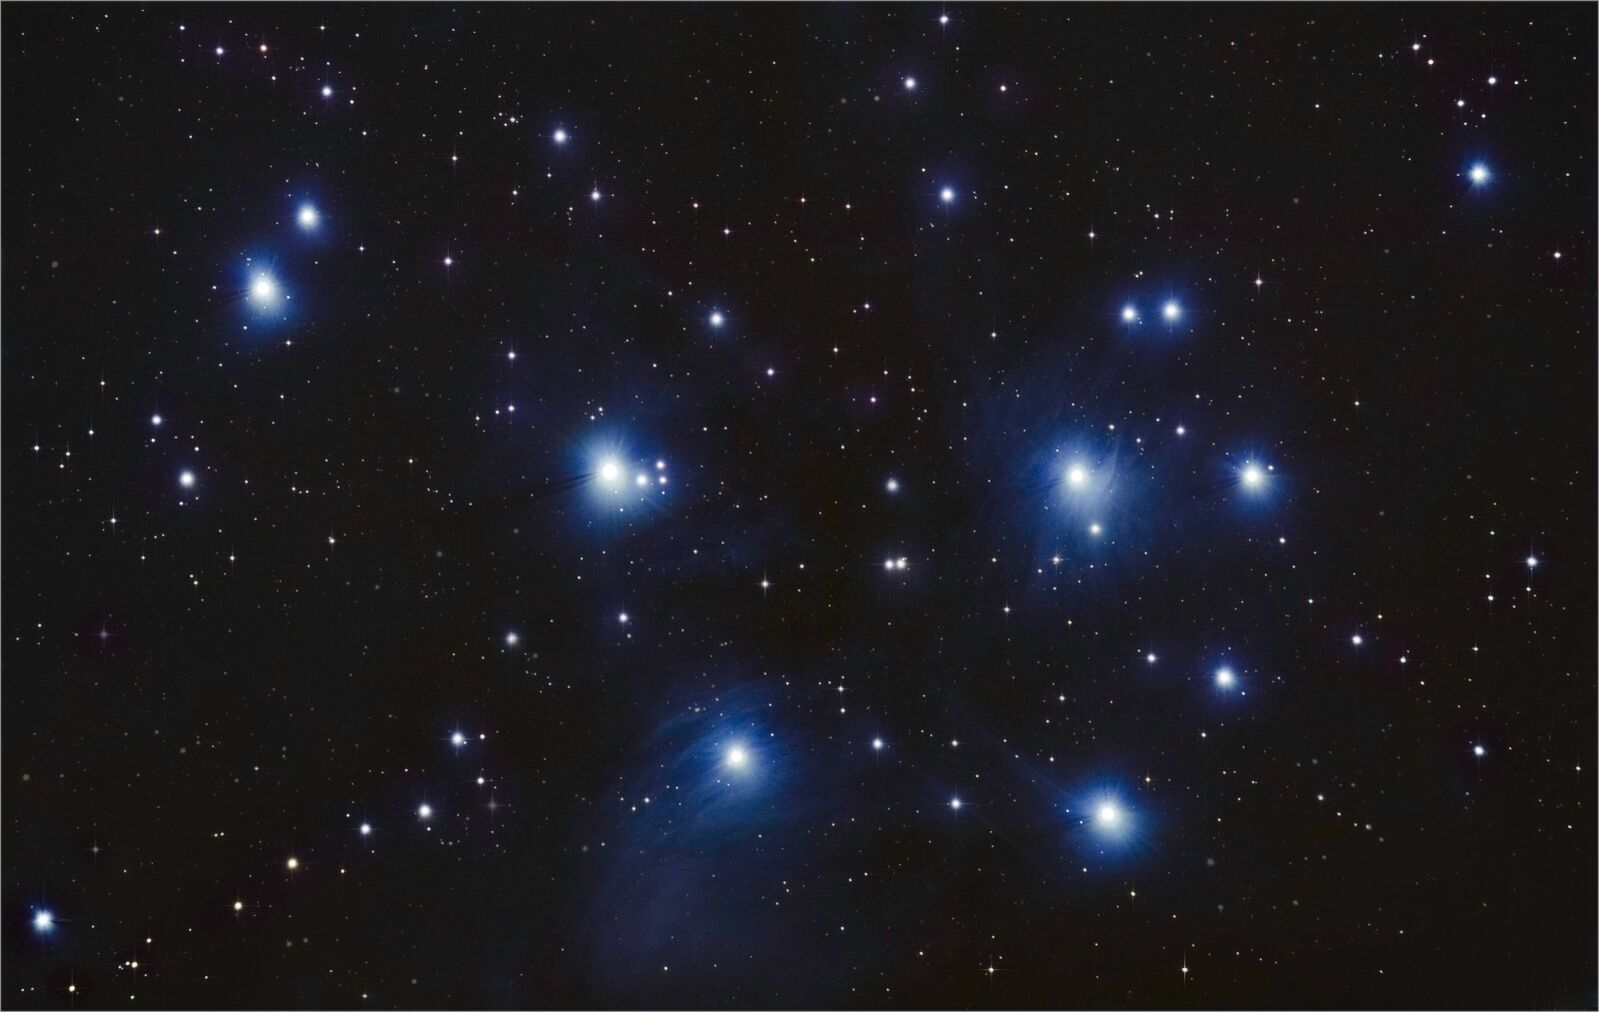 Pleides Cluster M45